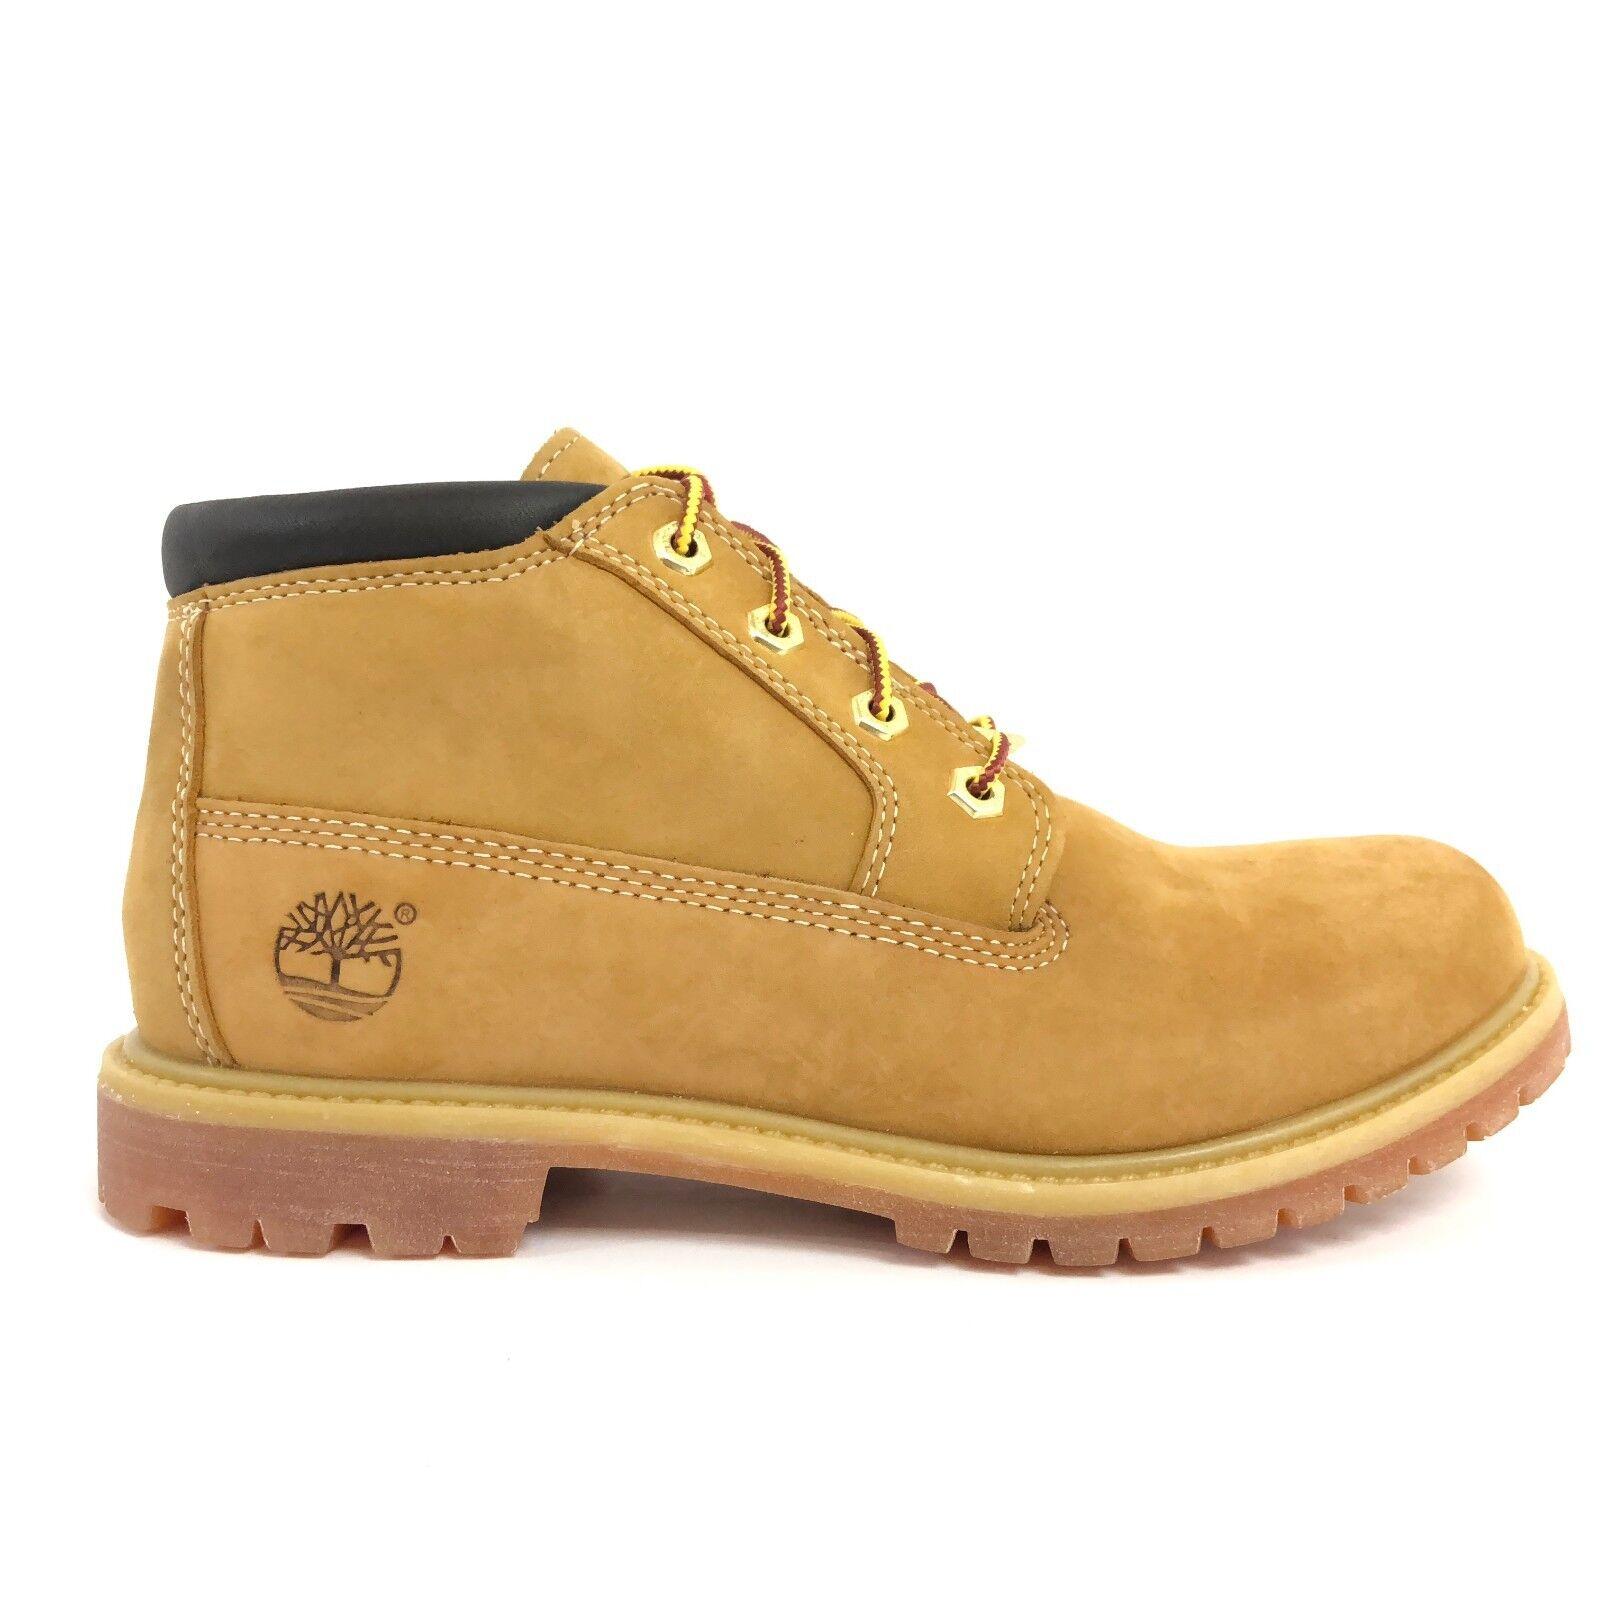 Timberland Women's Waterproof Nellie Chukka Double Wheat Boots 23399 1